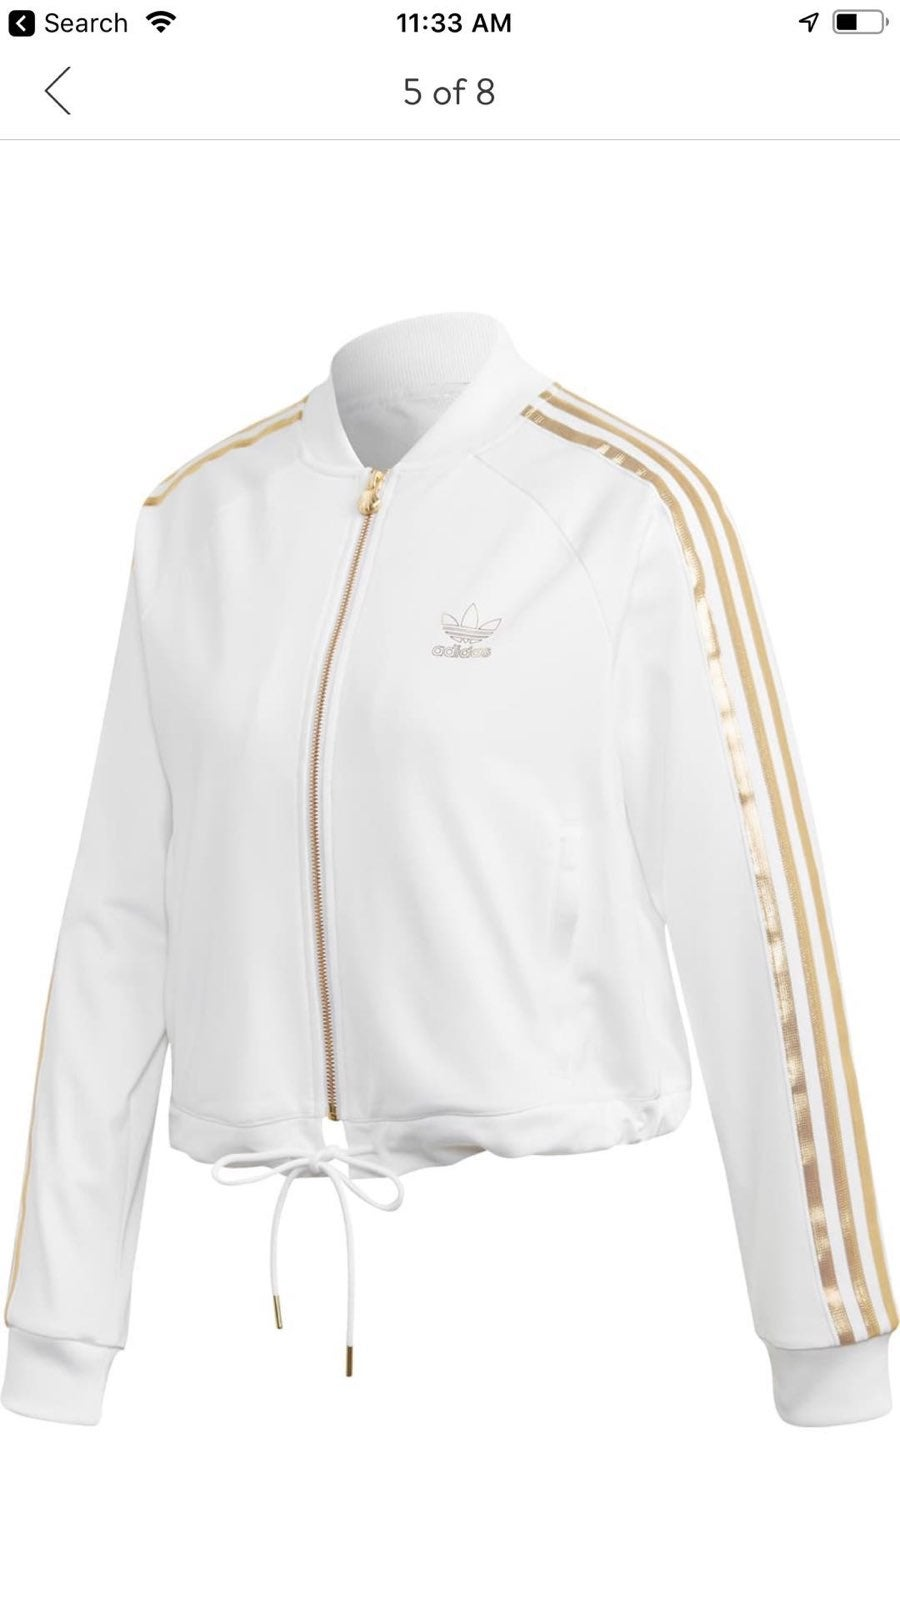 Adidas gold SST 2.0 track jacket